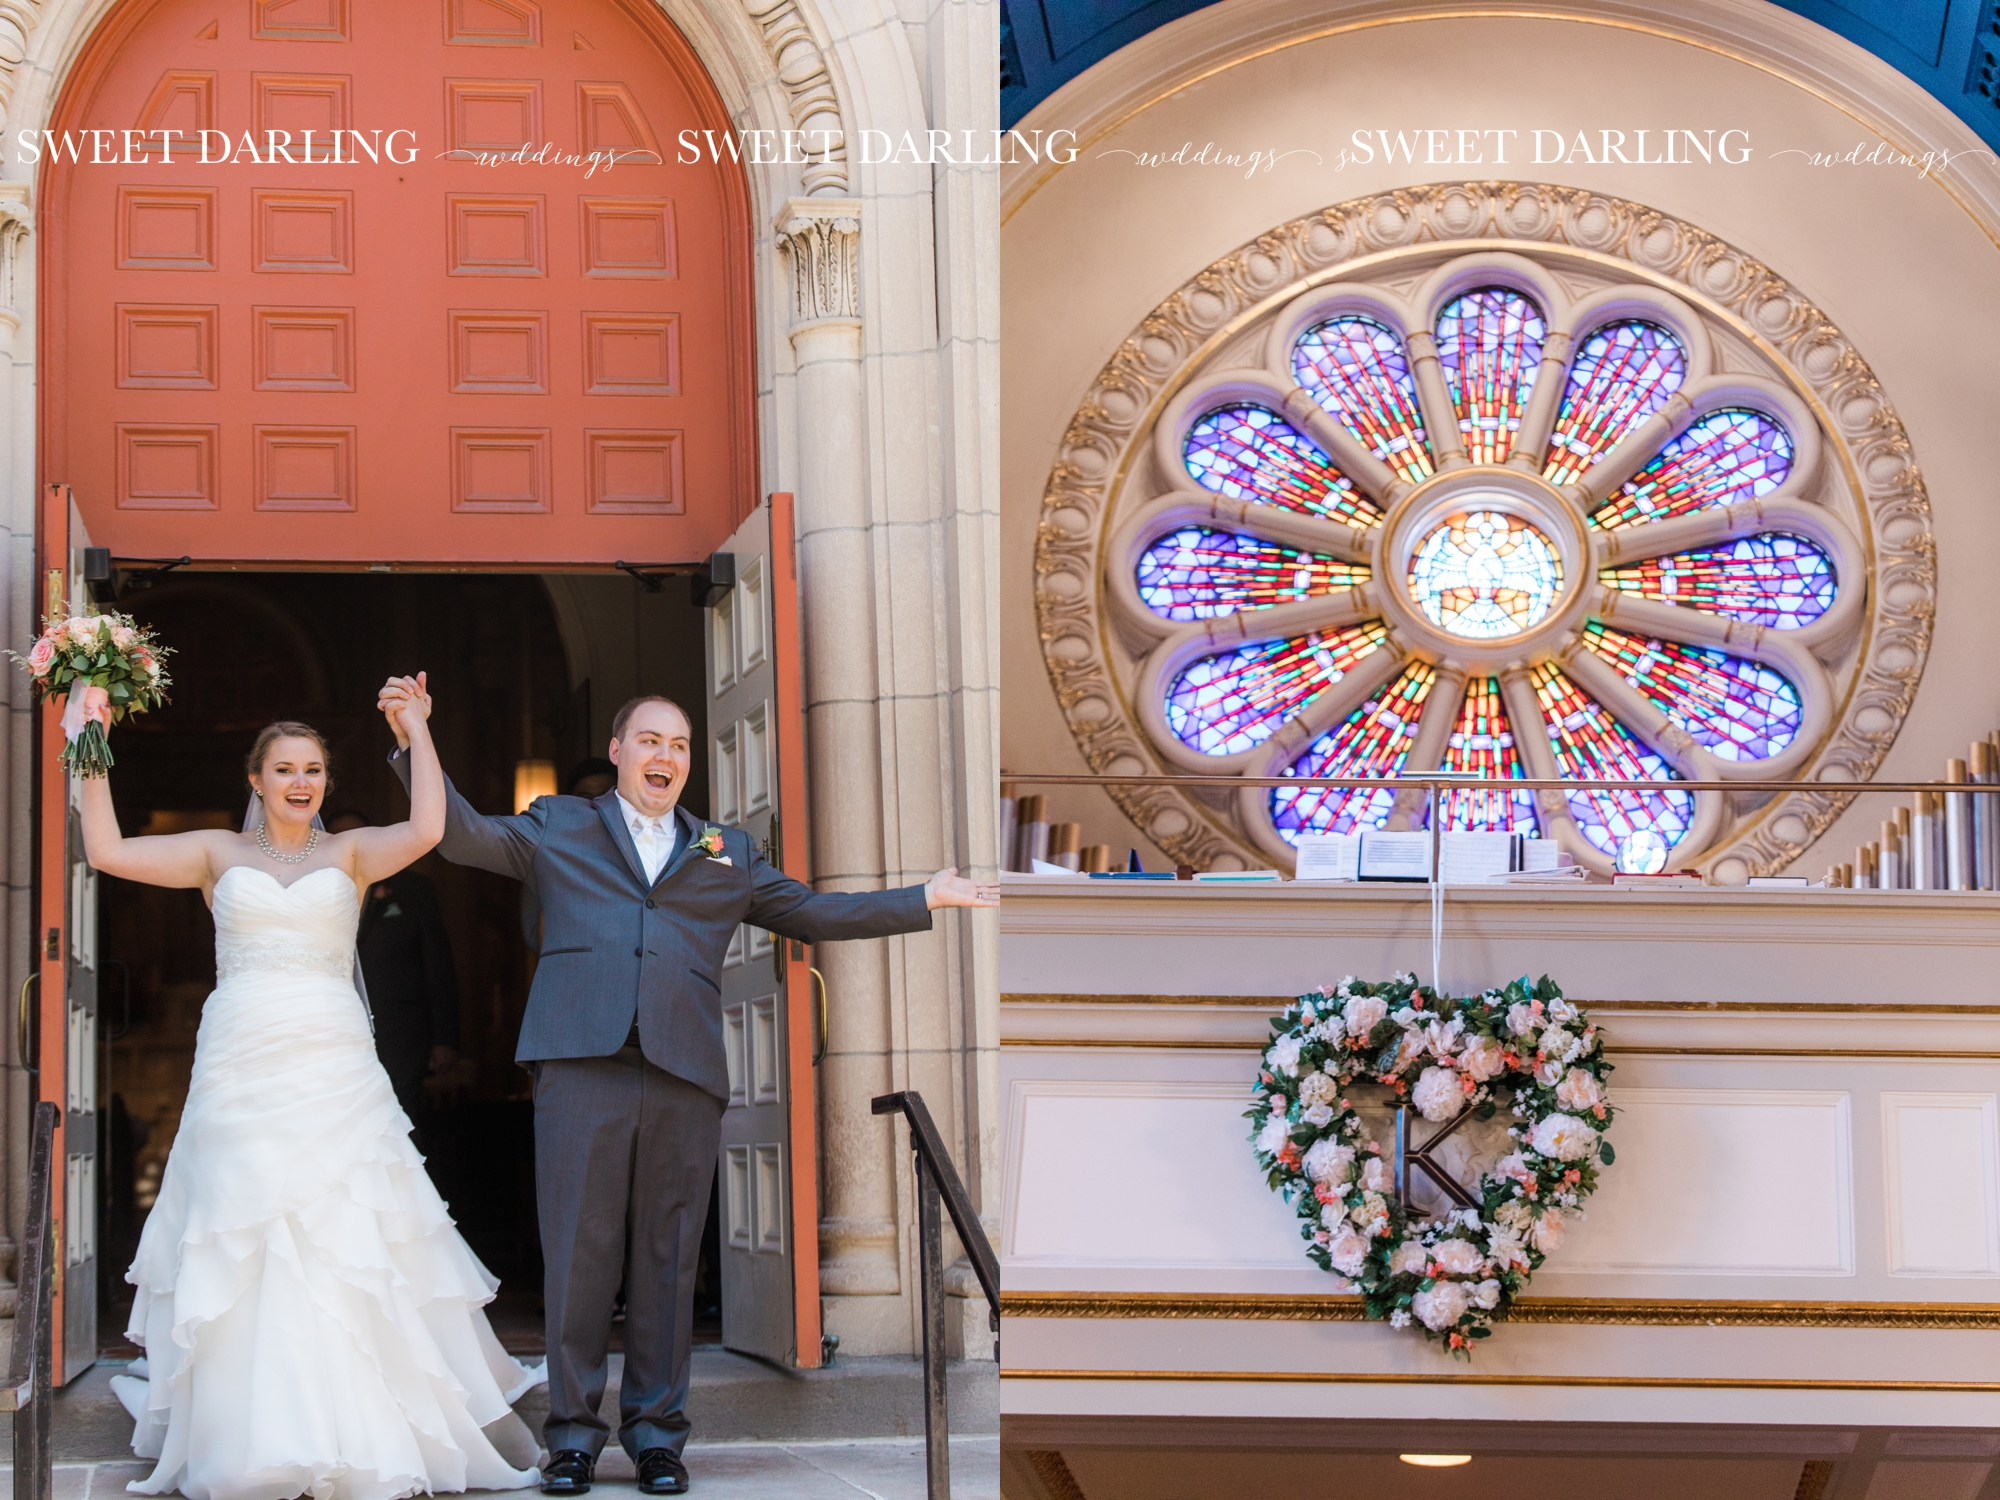 Holy-Cross-Catholic-Wedding-Photography-Champaign-County-IL-Sweet-Darling_1519.jpg